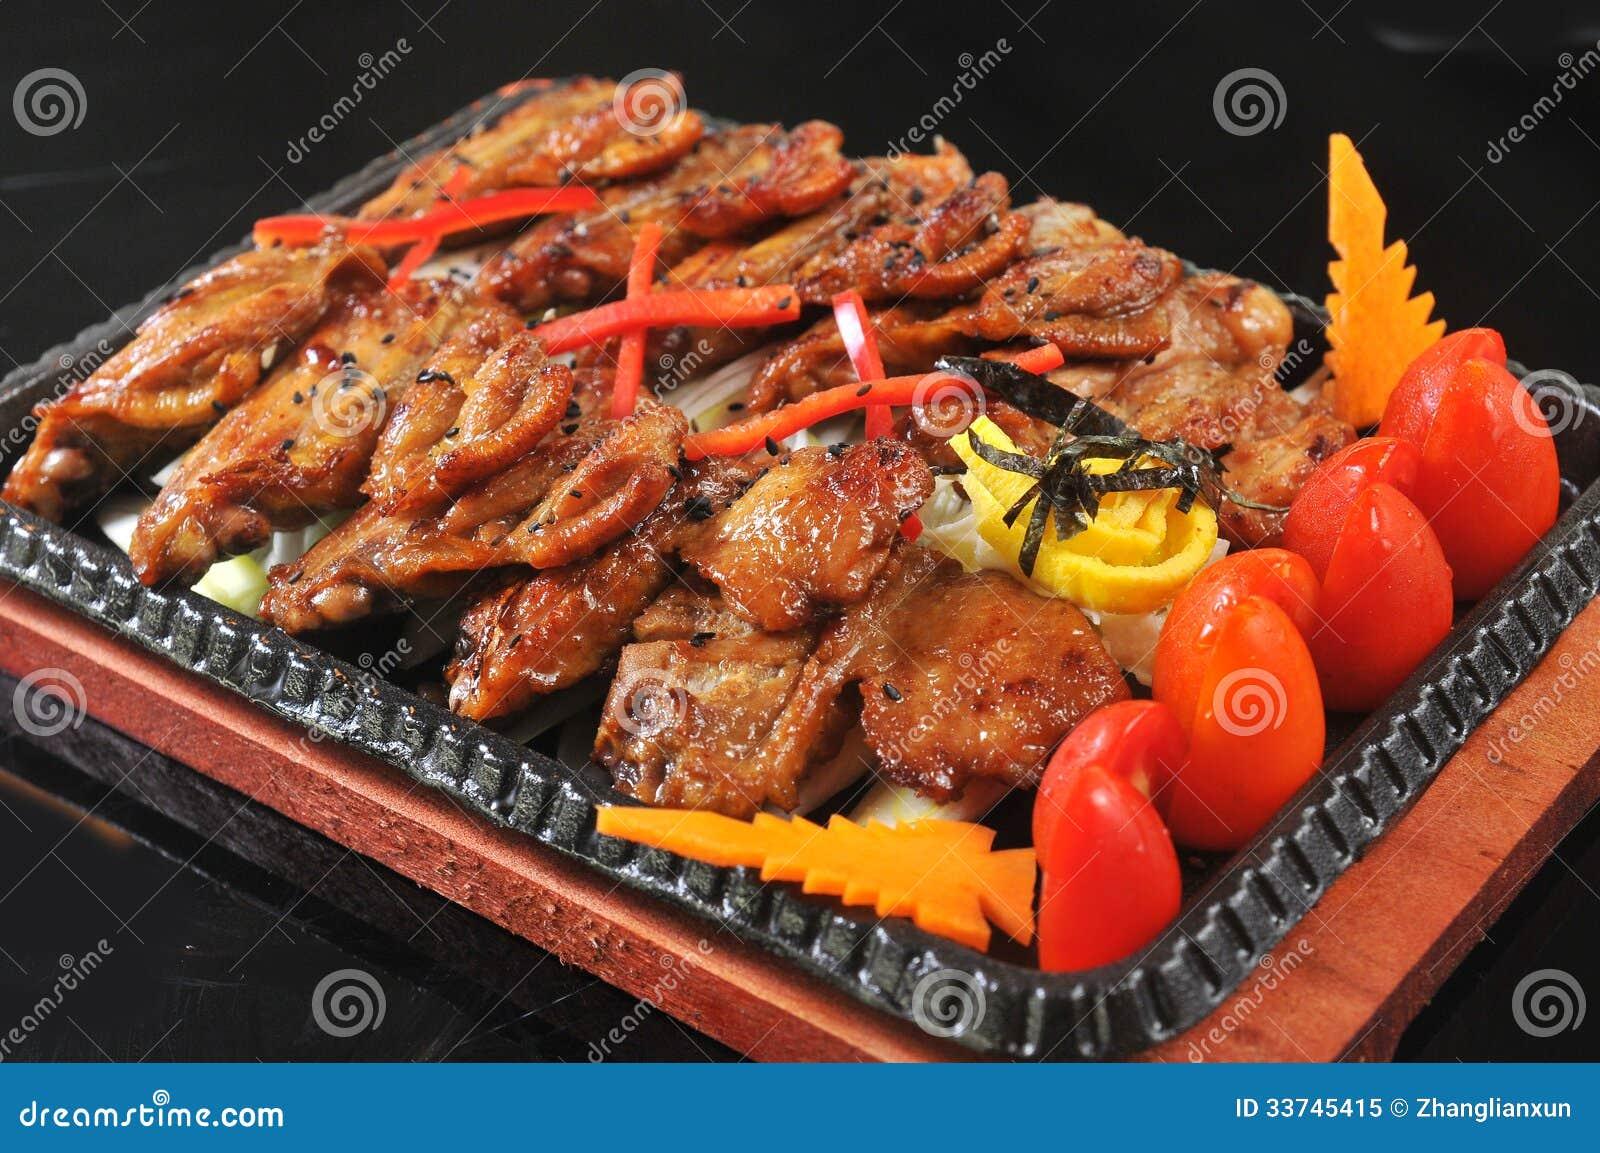 koreanische küche lizenzfreies stockfoto - bild: 33745415